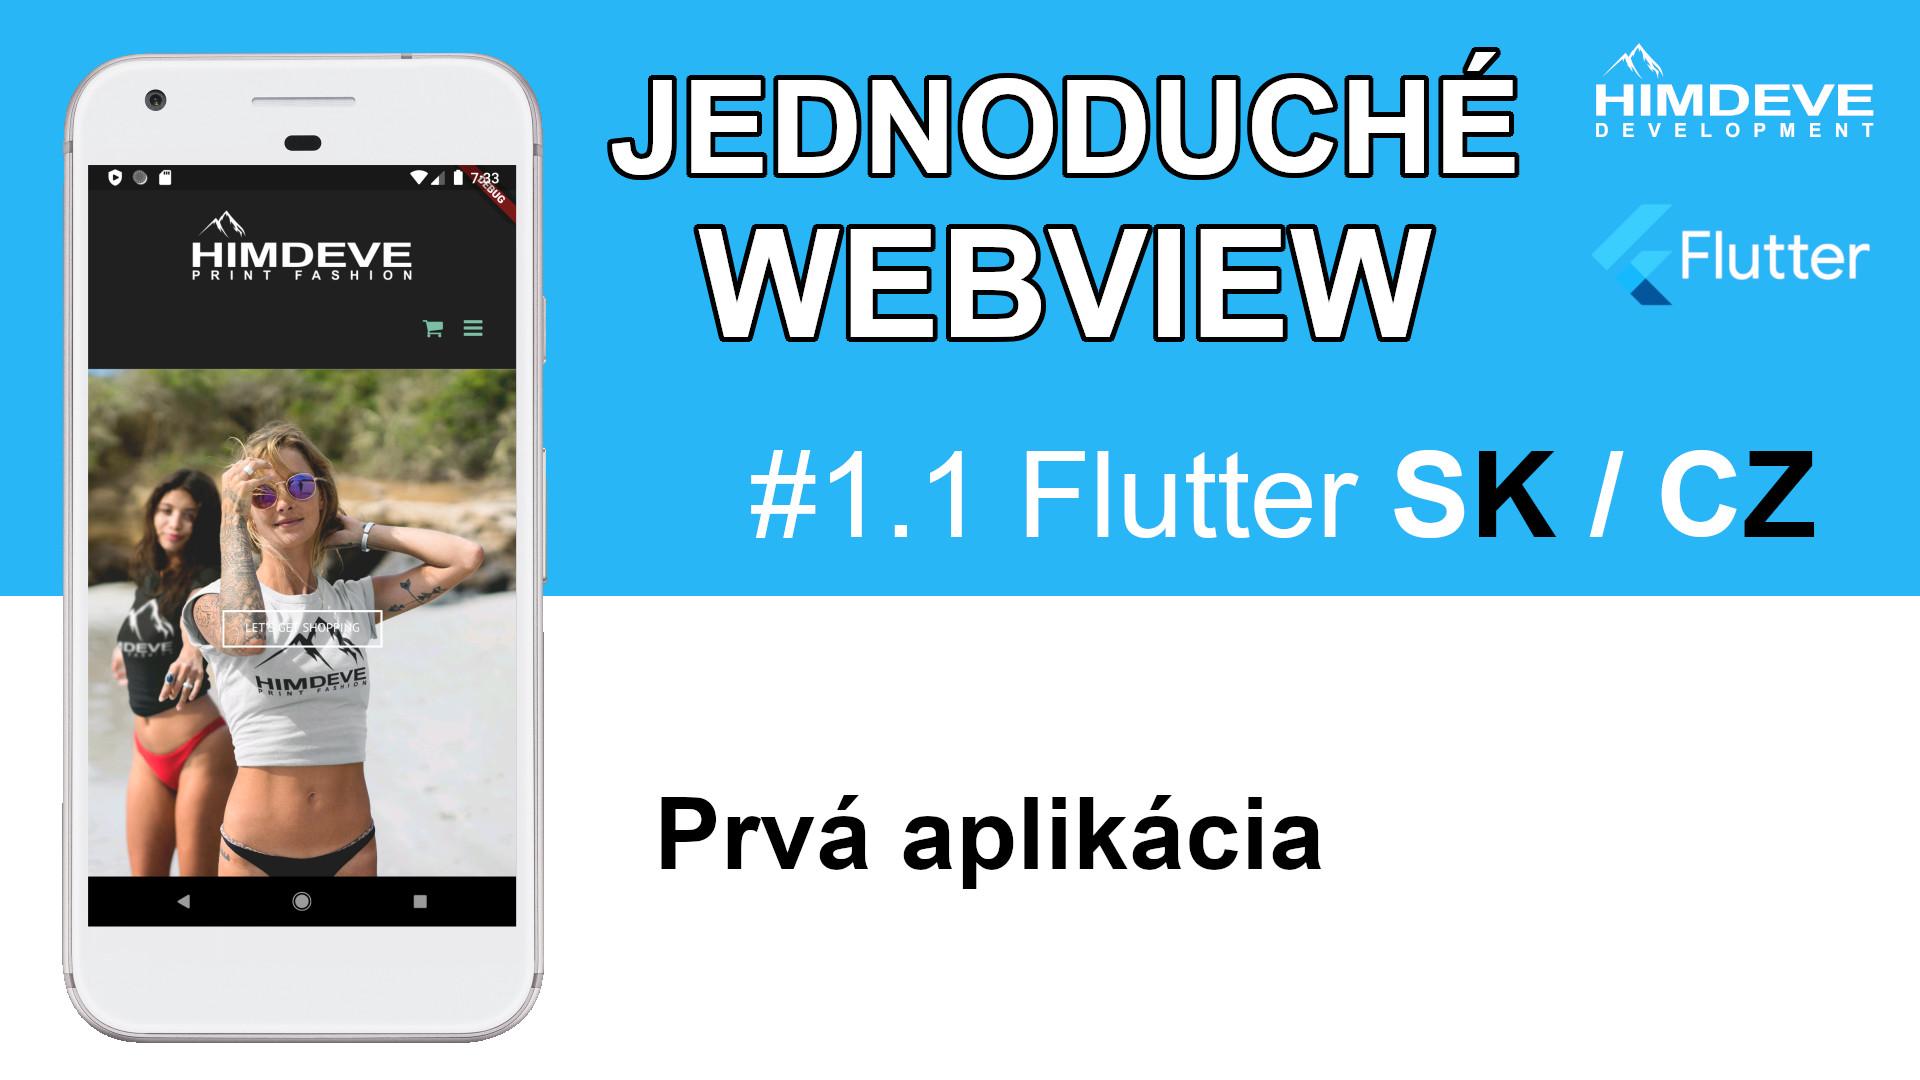 #1_1 Jedonduche Webview Flutter SK / CZ tutorialy